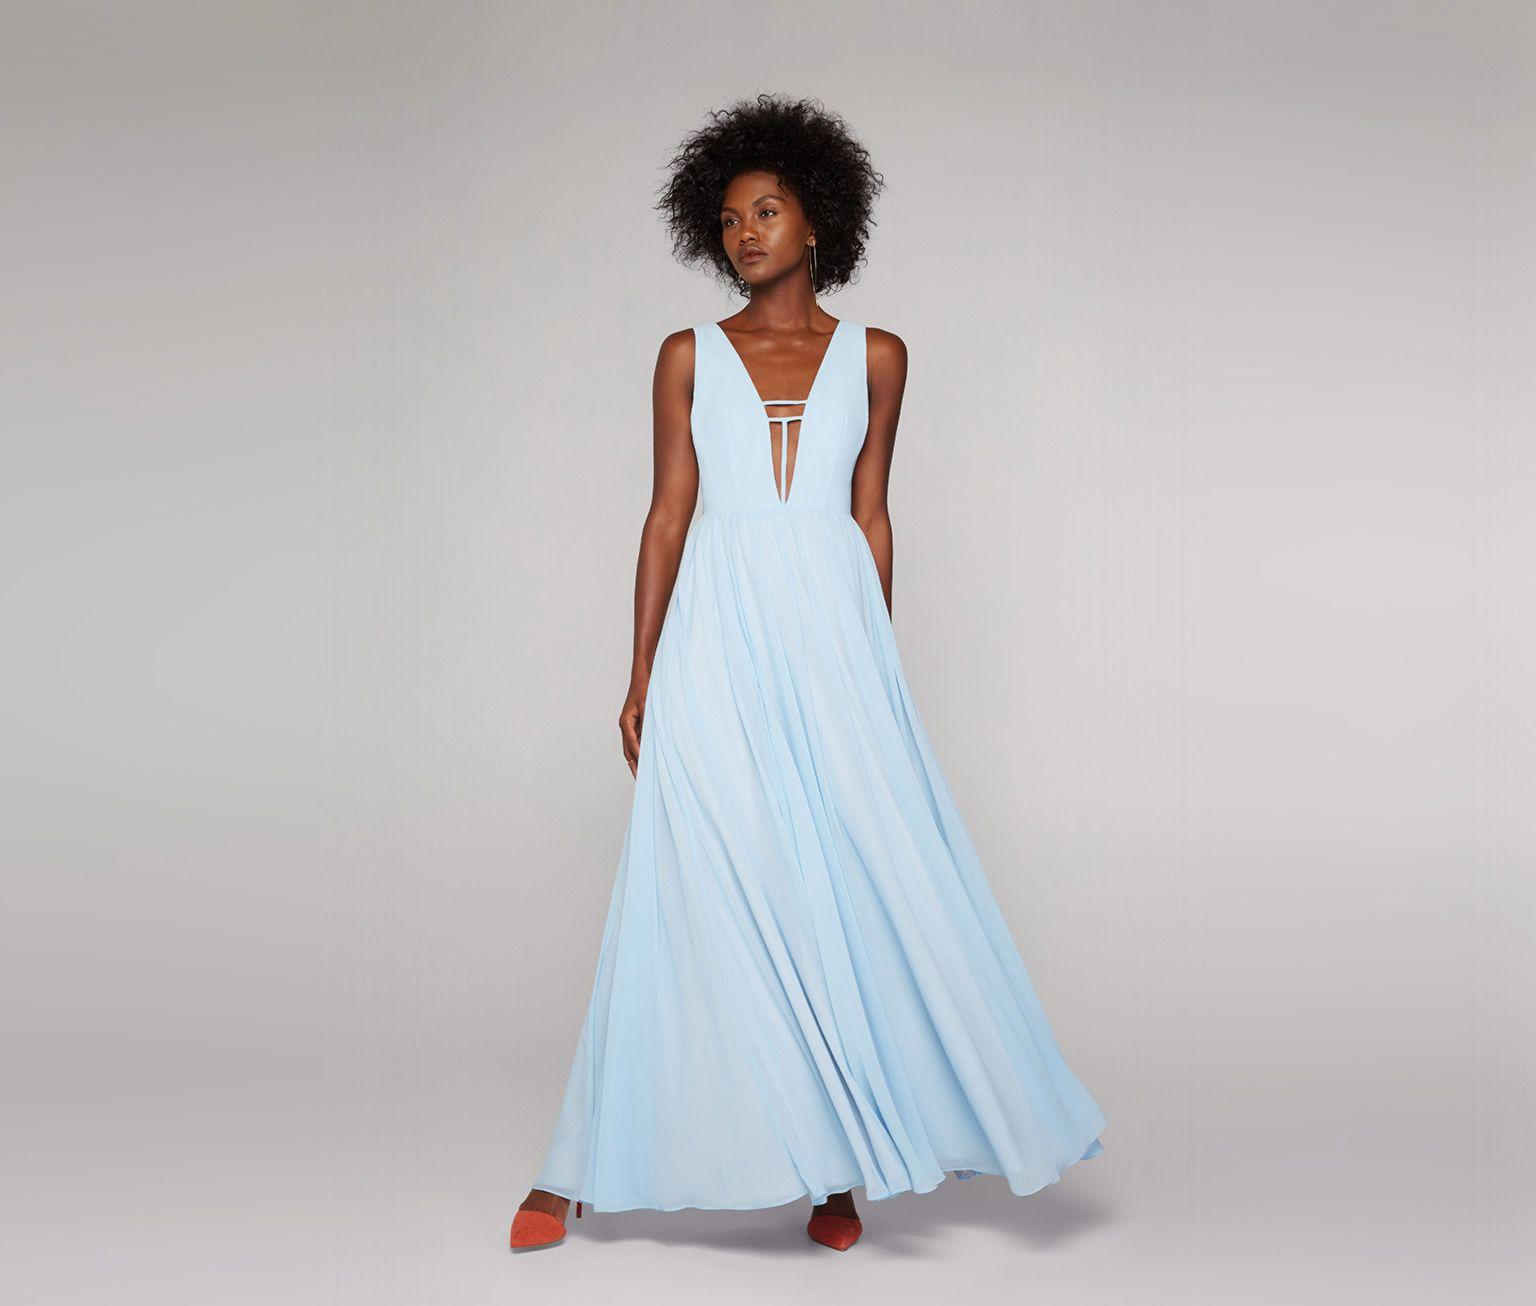 Ice Blue Summer Angel Dress Fame Partners Usa Summer Formal Dresses Pale Blue Bridesmaid Dresses Custom Prom Dress [ 1306 x 1536 Pixel ]